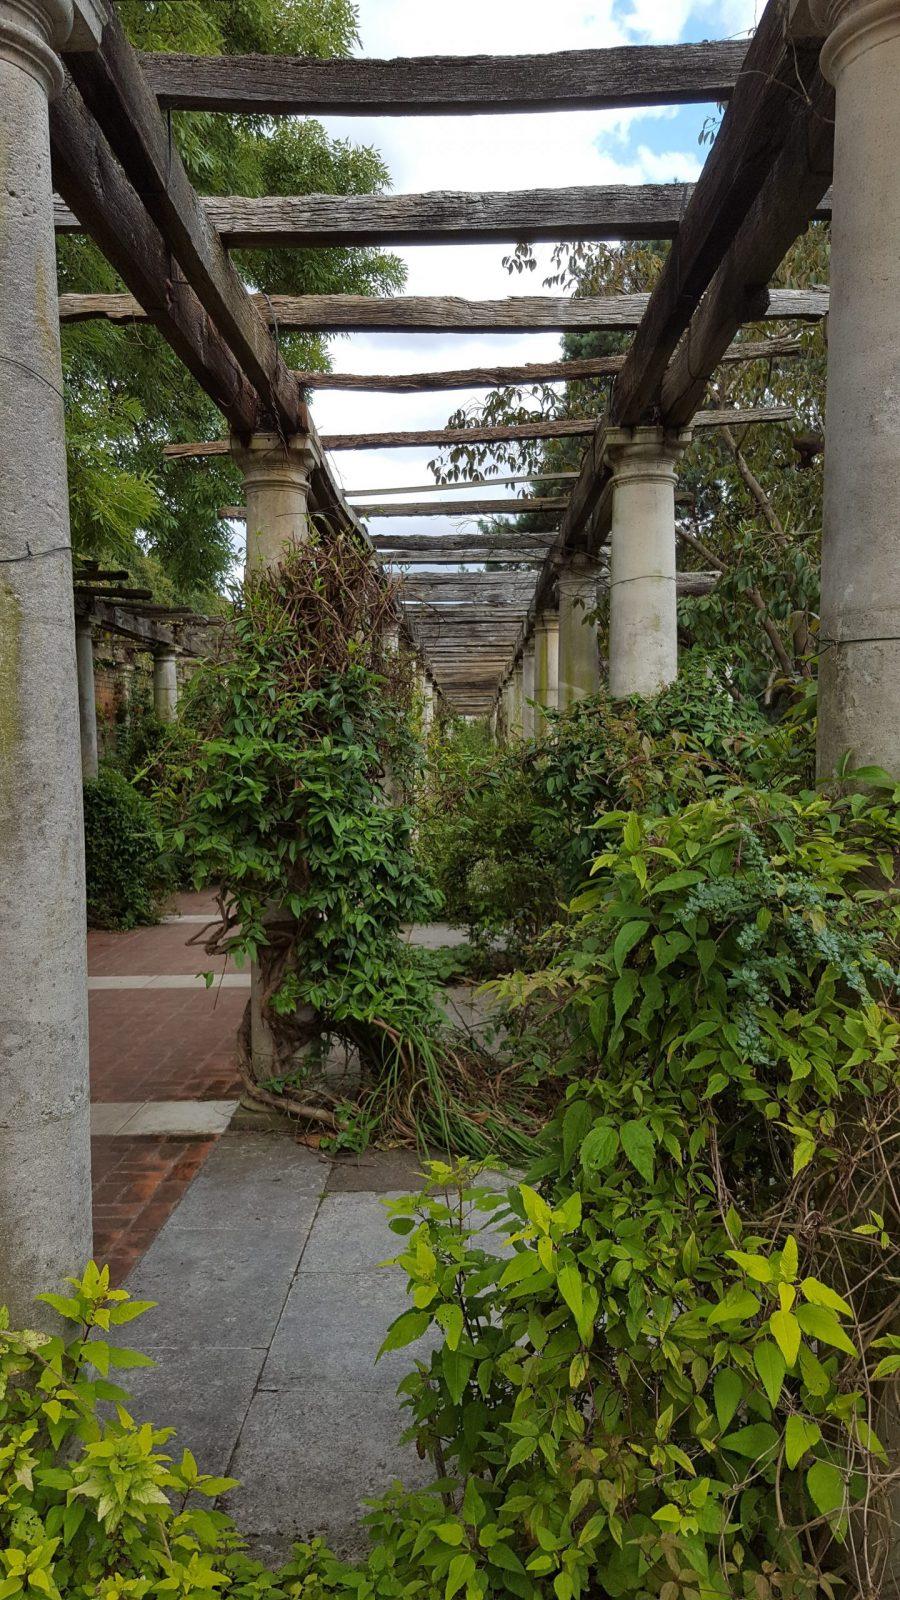 Visiting Hill Garden & Pergola, Hampstead Heath: Photo Gallery 4